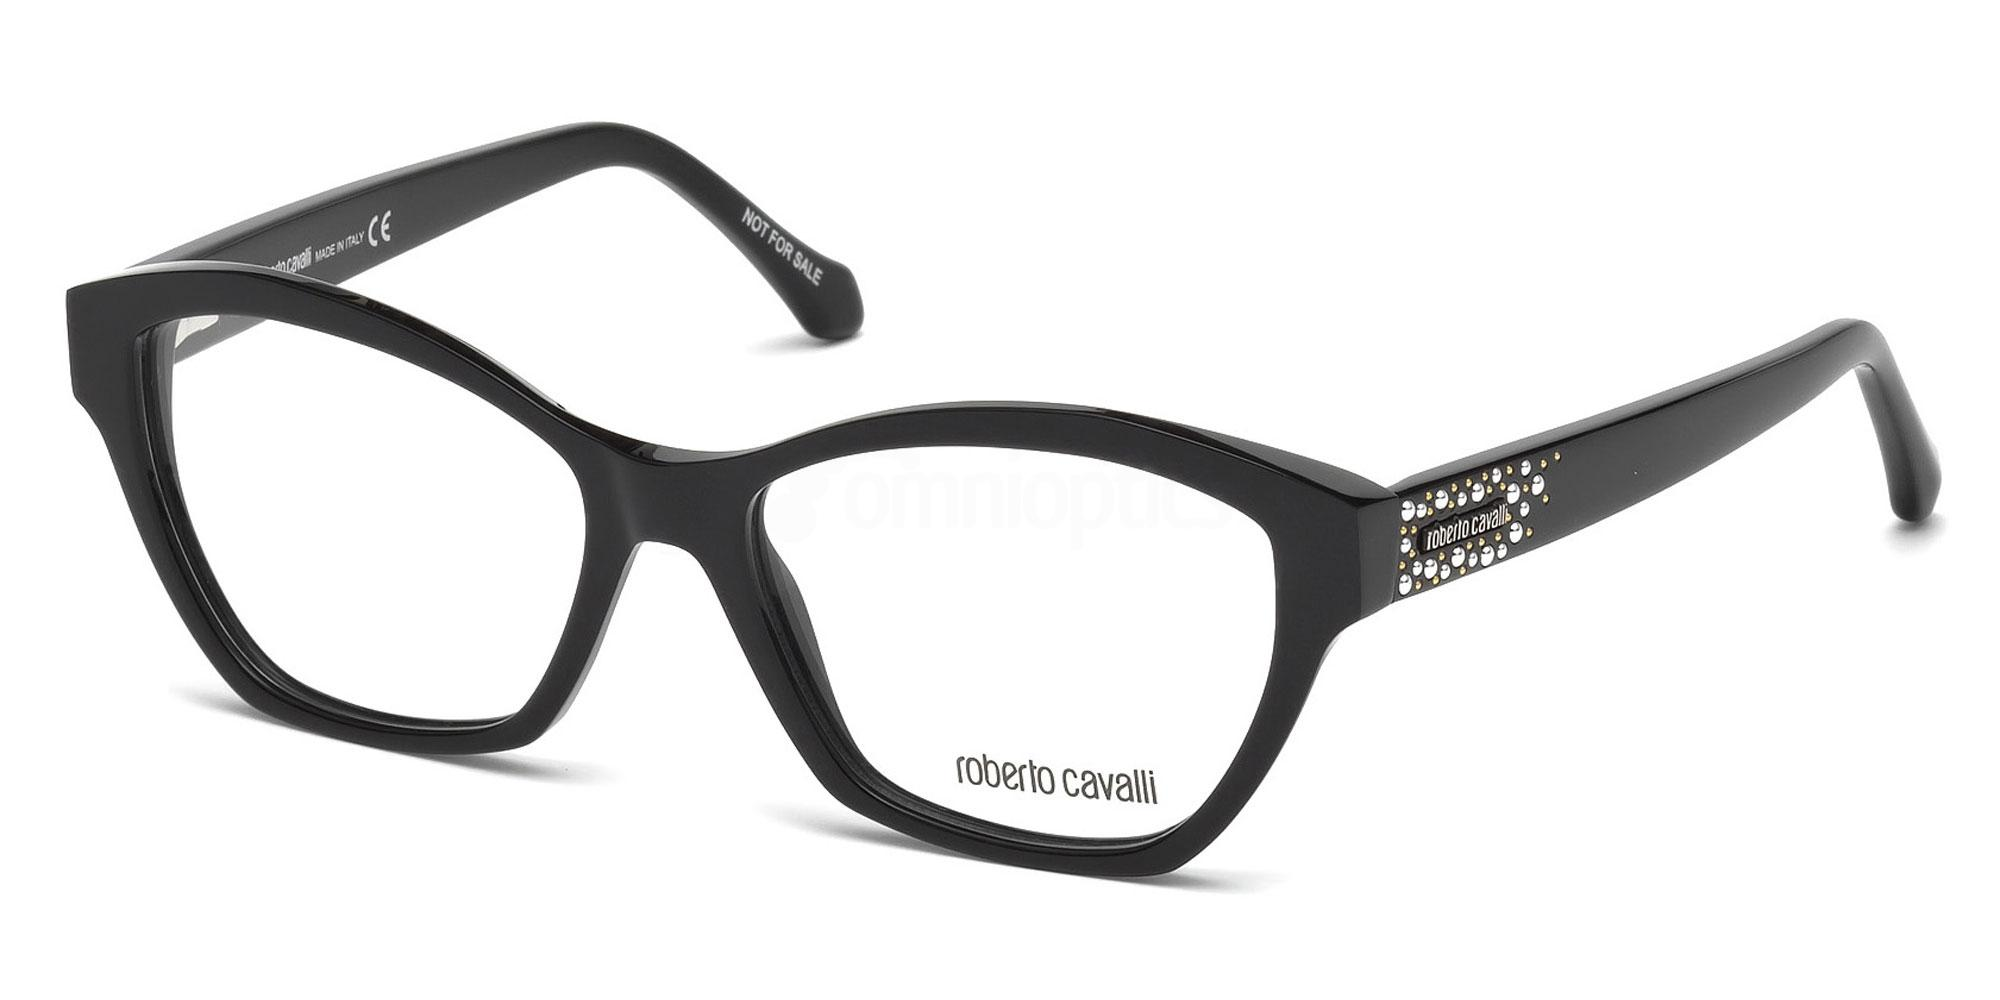 001 RC5038 , Roberto Cavalli